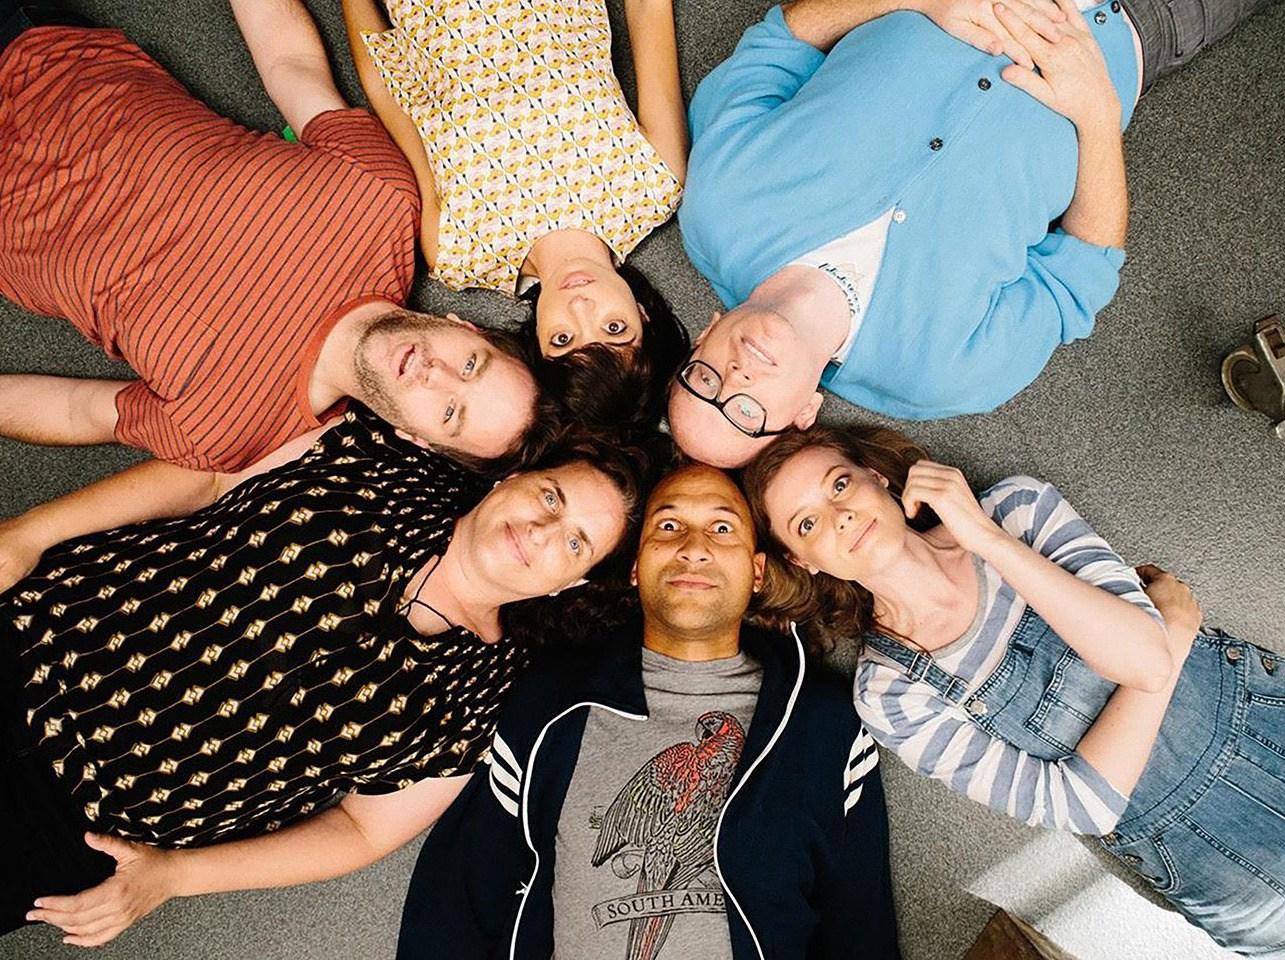 Mike Birbiglia, Kate Micucci, Chris Gethard, Gillian Jacobs, Keegan Michael-Key, and Tami Sagher star in  Don't Think Twice